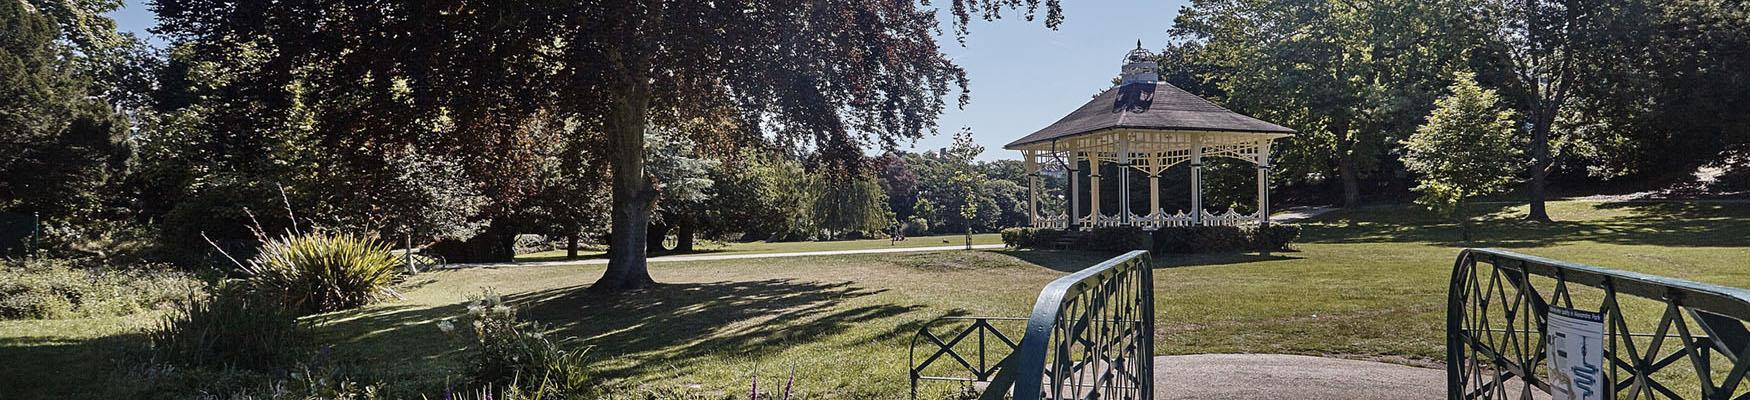 Alexandra Park in Hastings